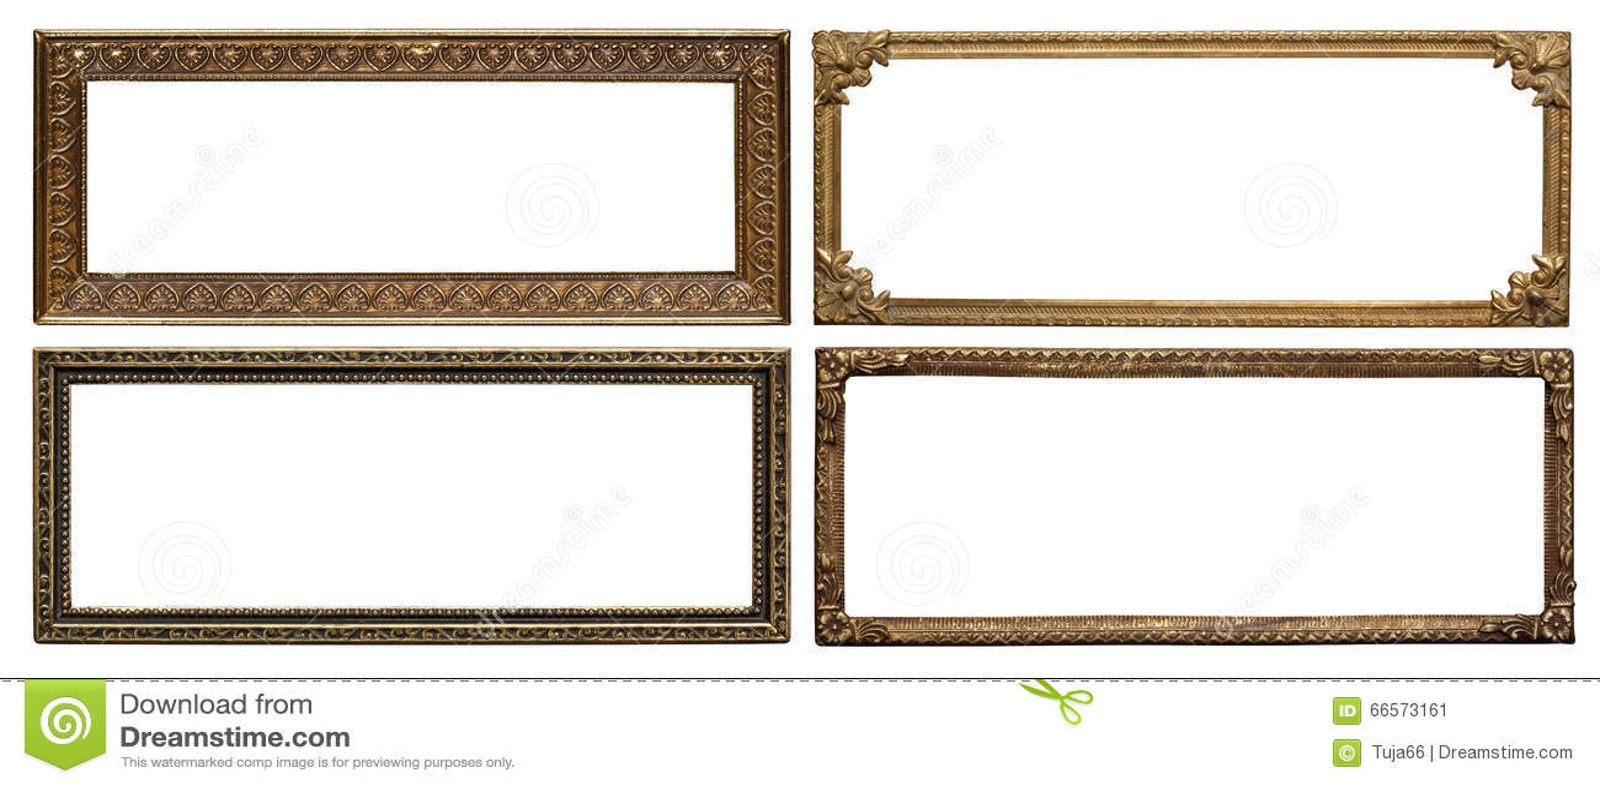 Ornate metal frames stock image. Image of border, empty - 66573161